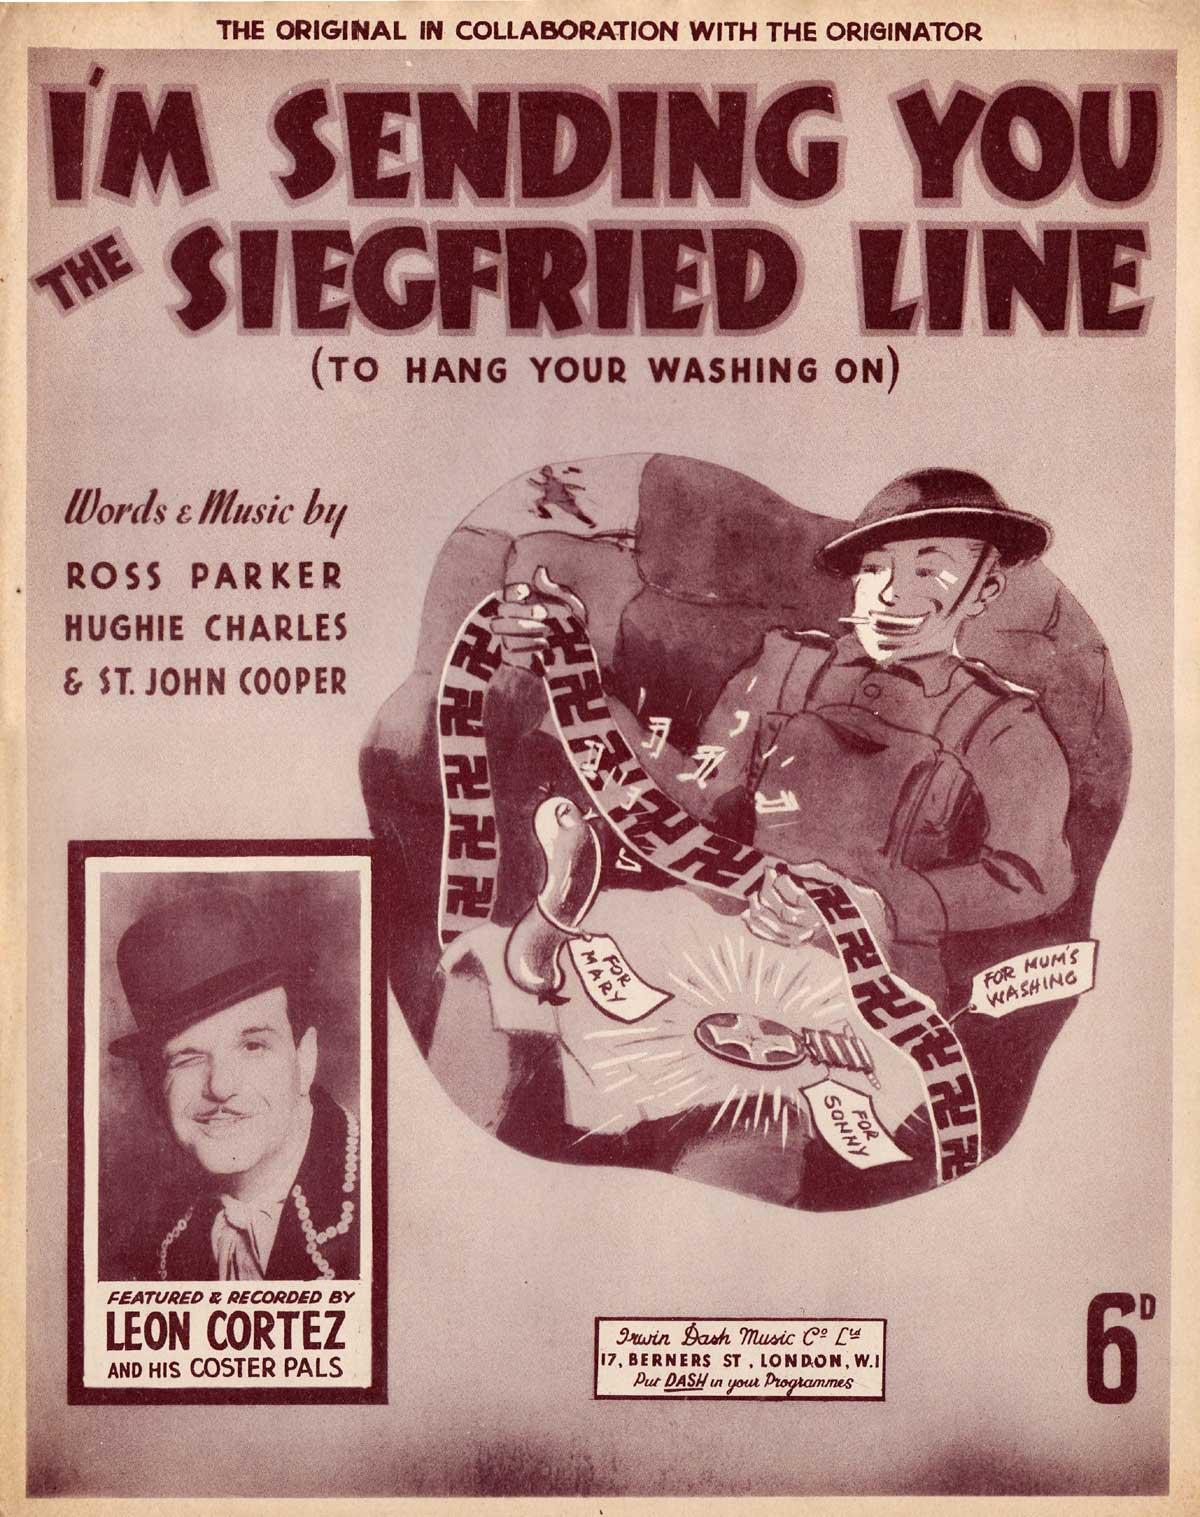 I'm Sending You the Siegfried Line (Leon Cortez)